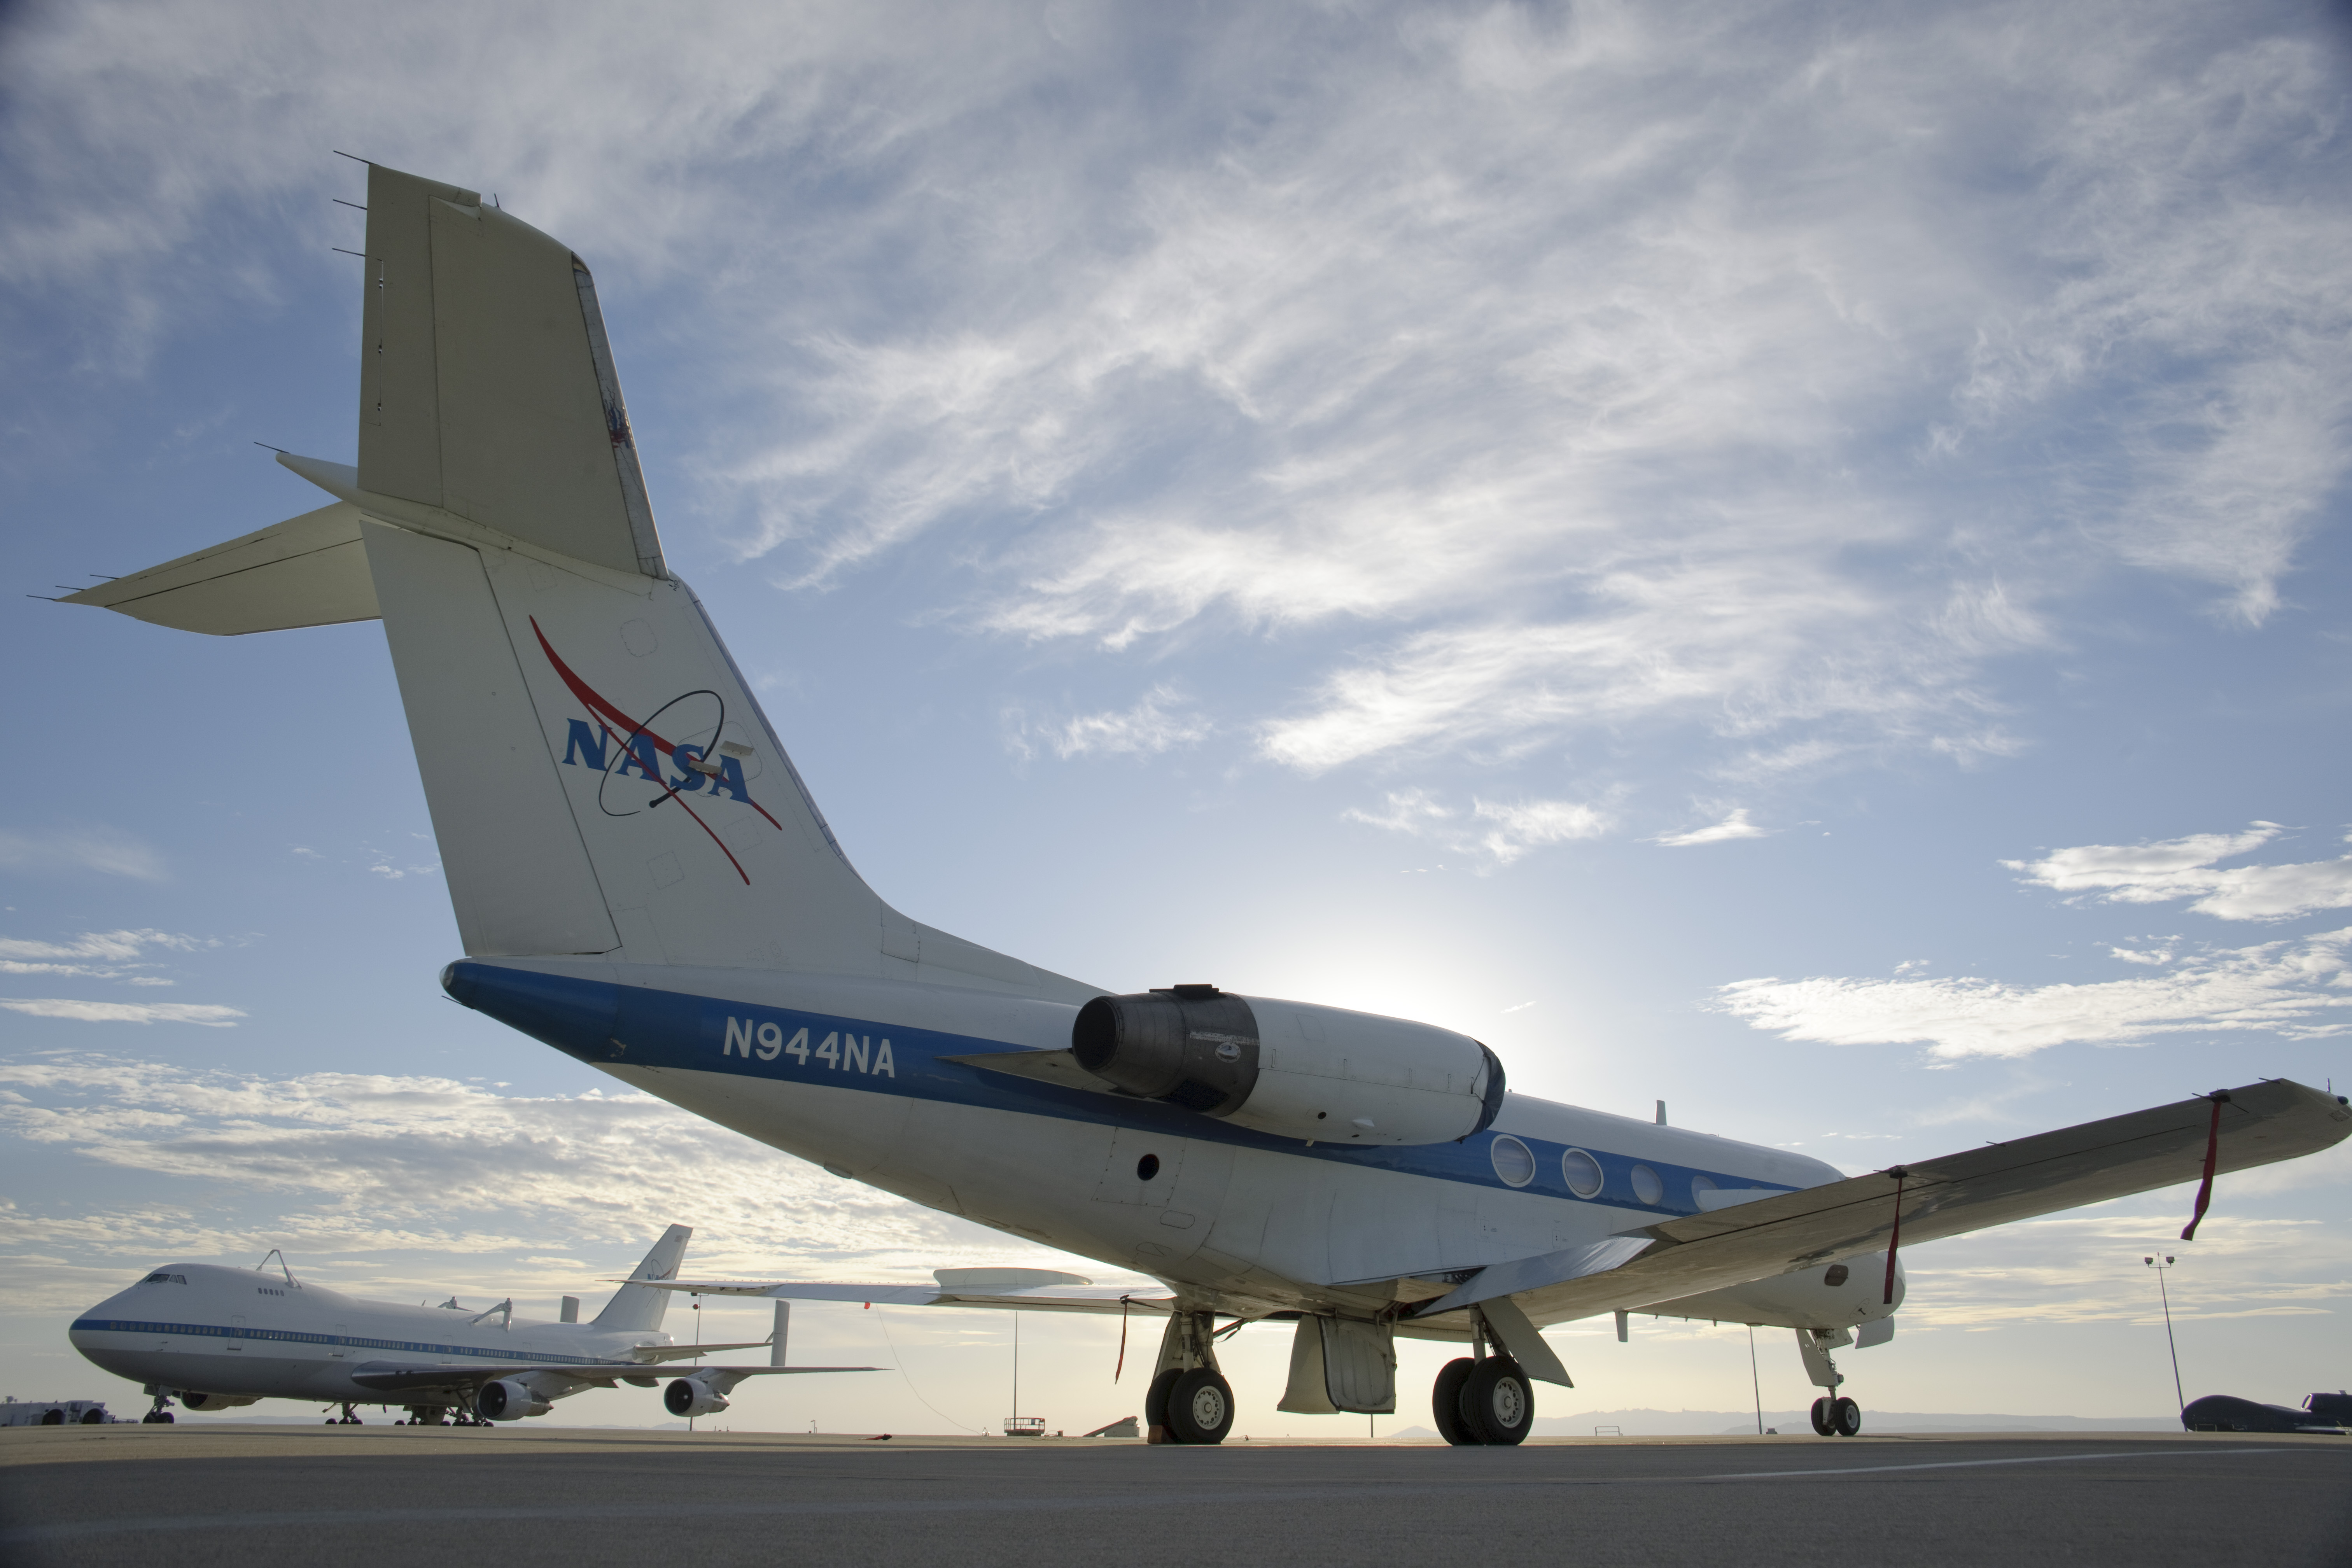 NASA - Shuttle Training Aircraft to be Retired at NASA Dryden